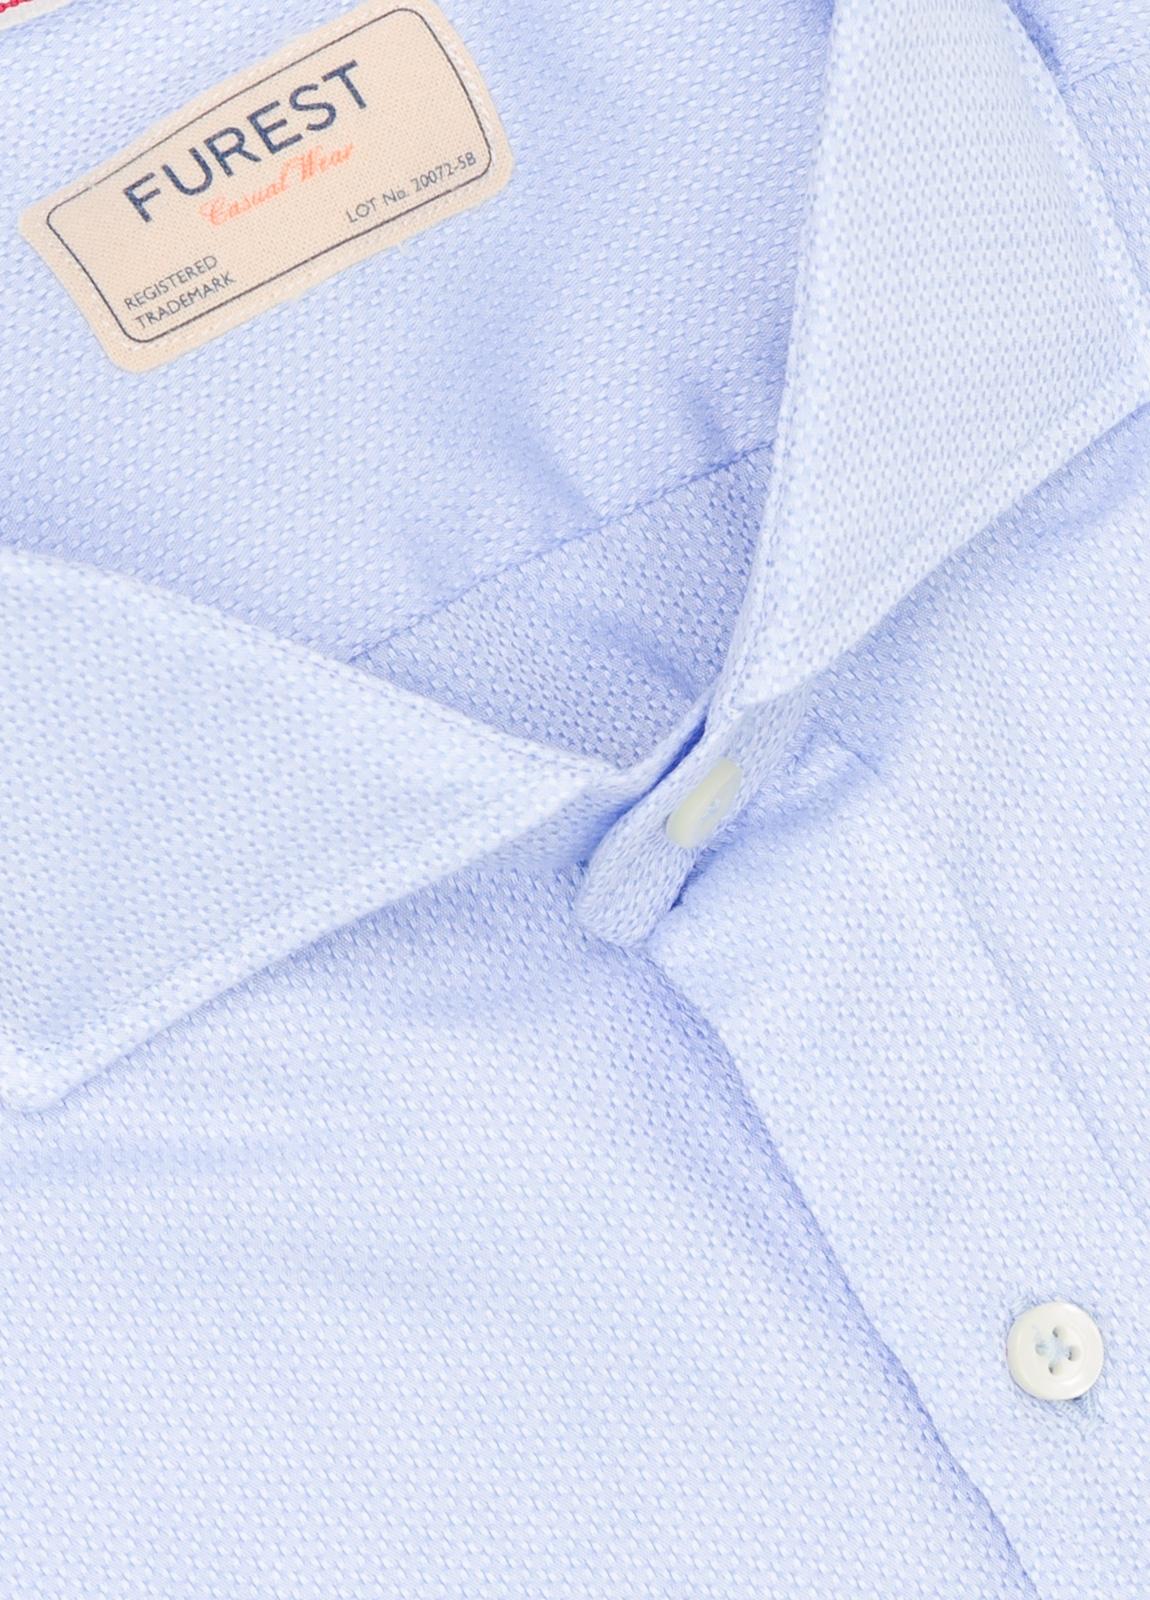 Camisa Casual Wear SLIM FIT Modelo CAPRI diseño liso micro grabado color celeste. 100% Algodón. - Ítem1